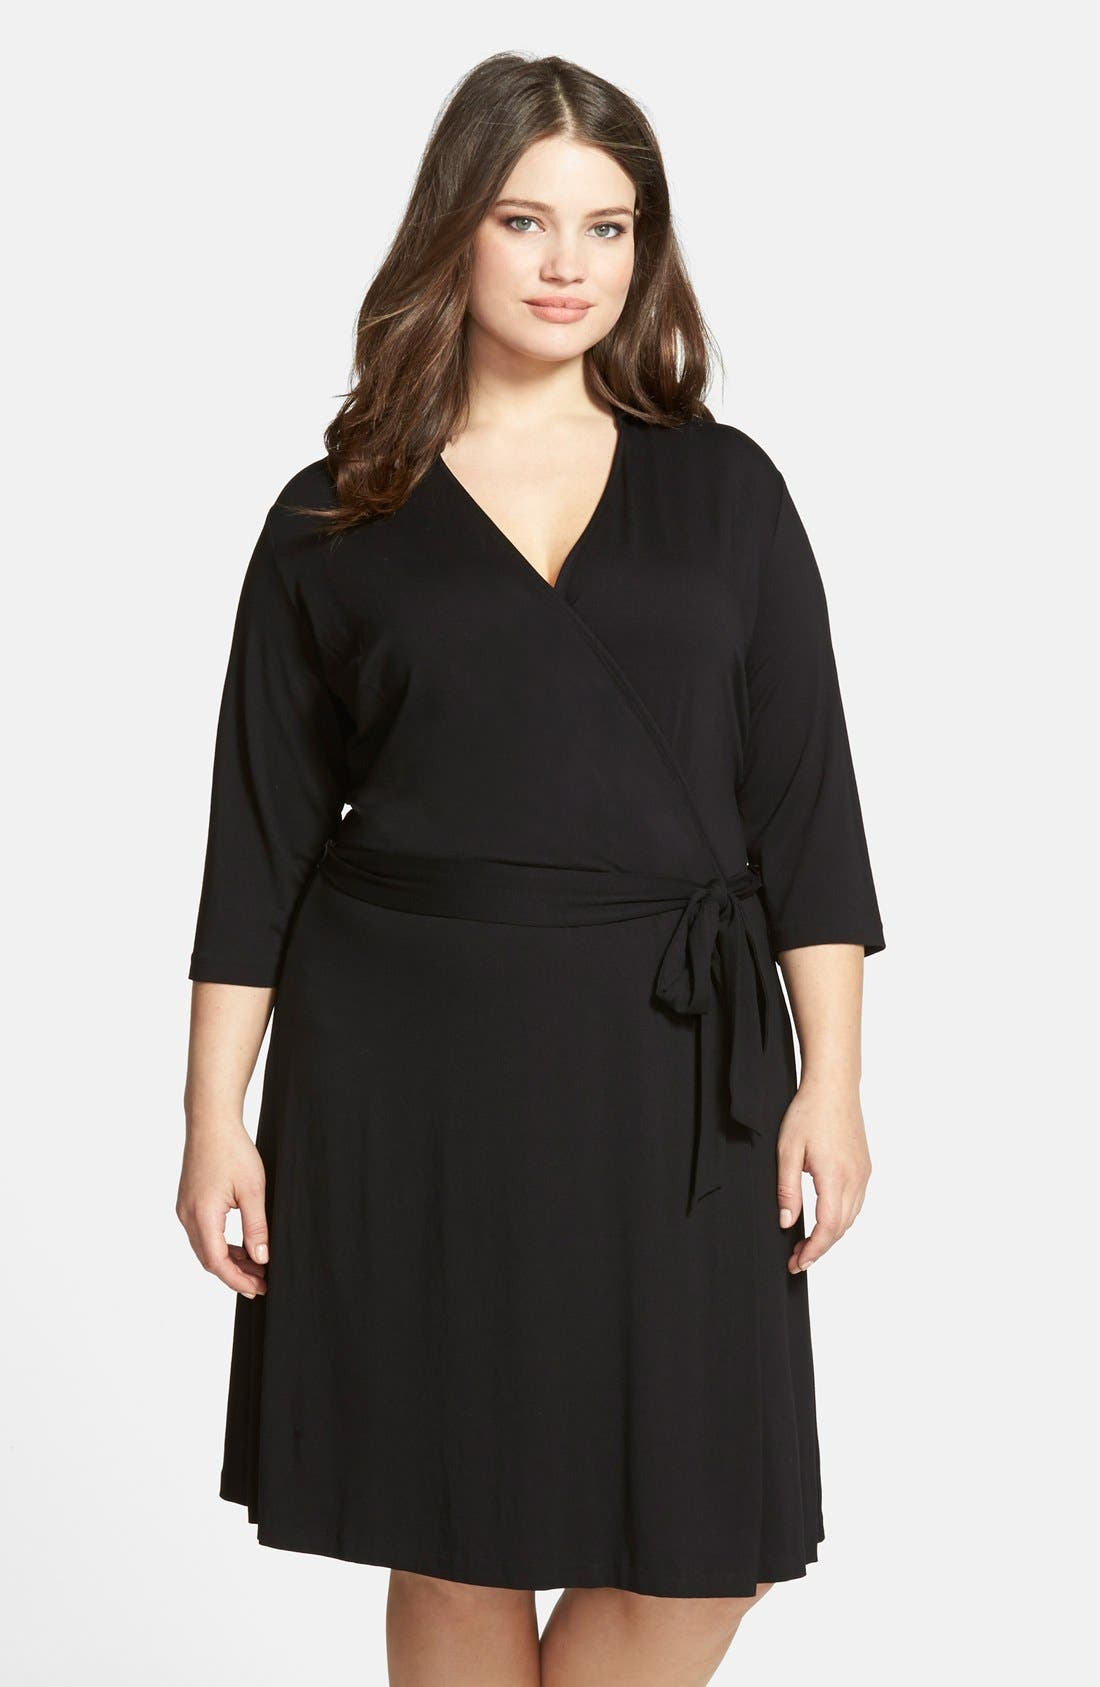 Alternate Image 1 Selected - Vince Camuto Jersey Faux Wrap Dress (Plus Size)